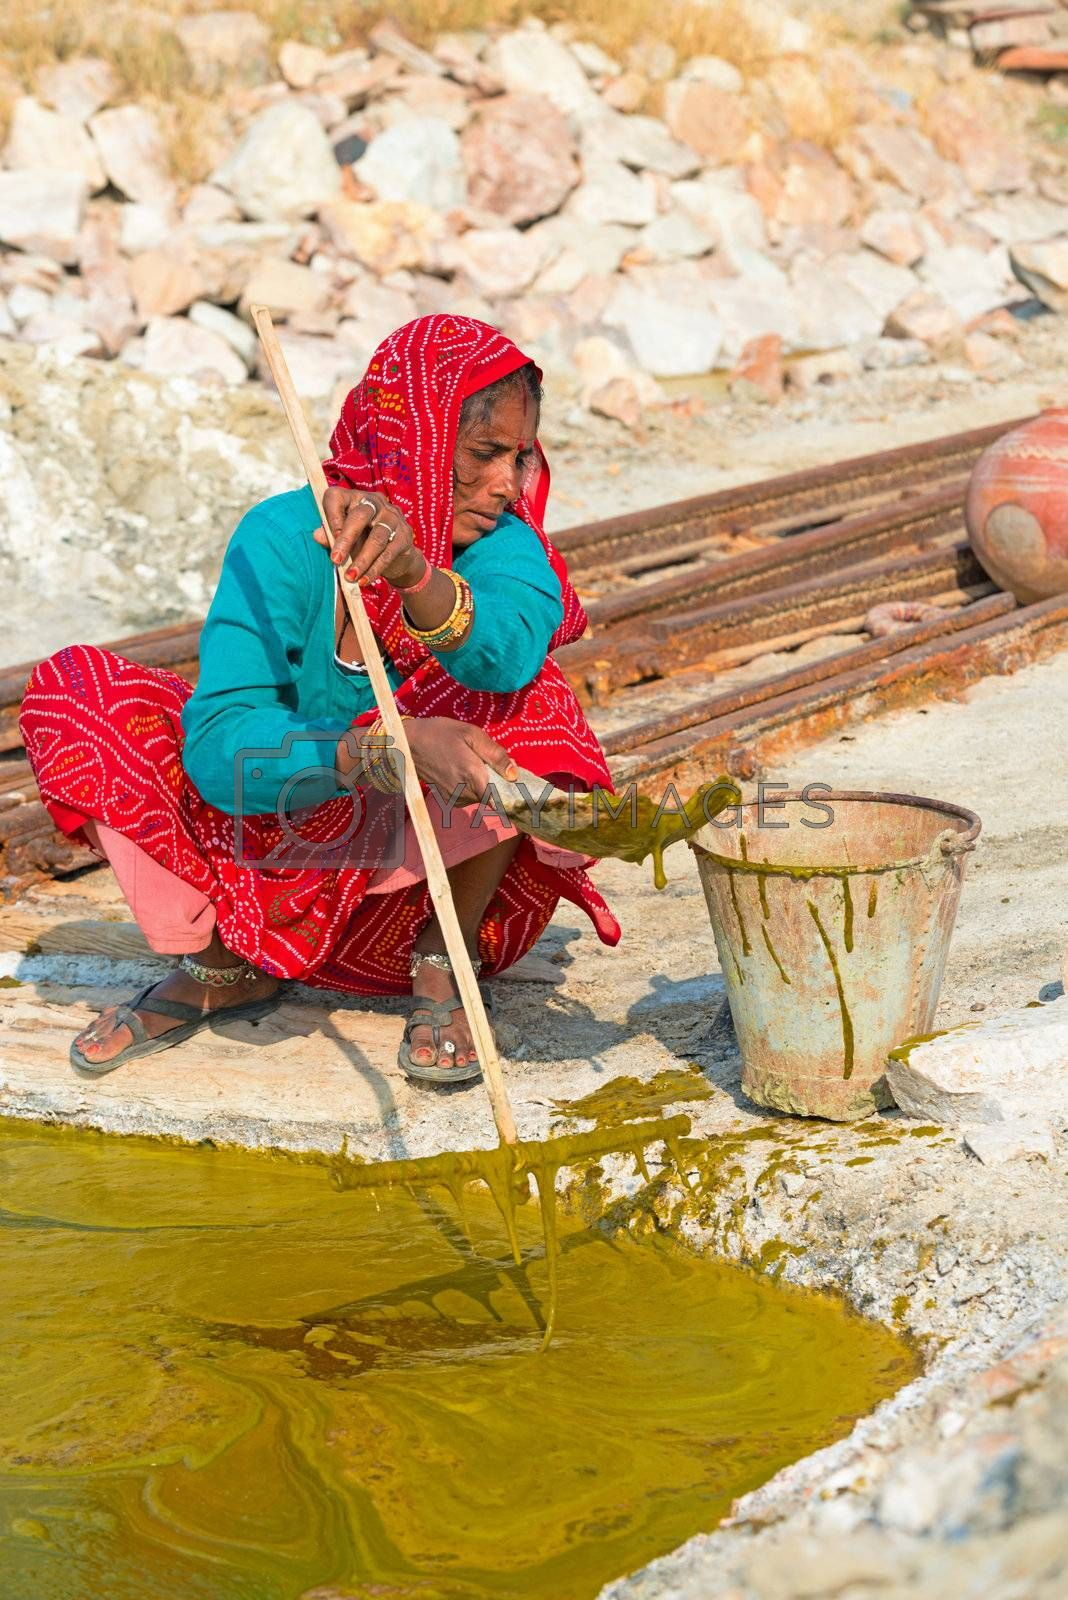 Sambhar, India - Nov 19: Woman collects algae on Nov 19, 2012 in Sambhar Salt Lake, India. The specialized algae and bacteria growing in the lake provide striking water colours.